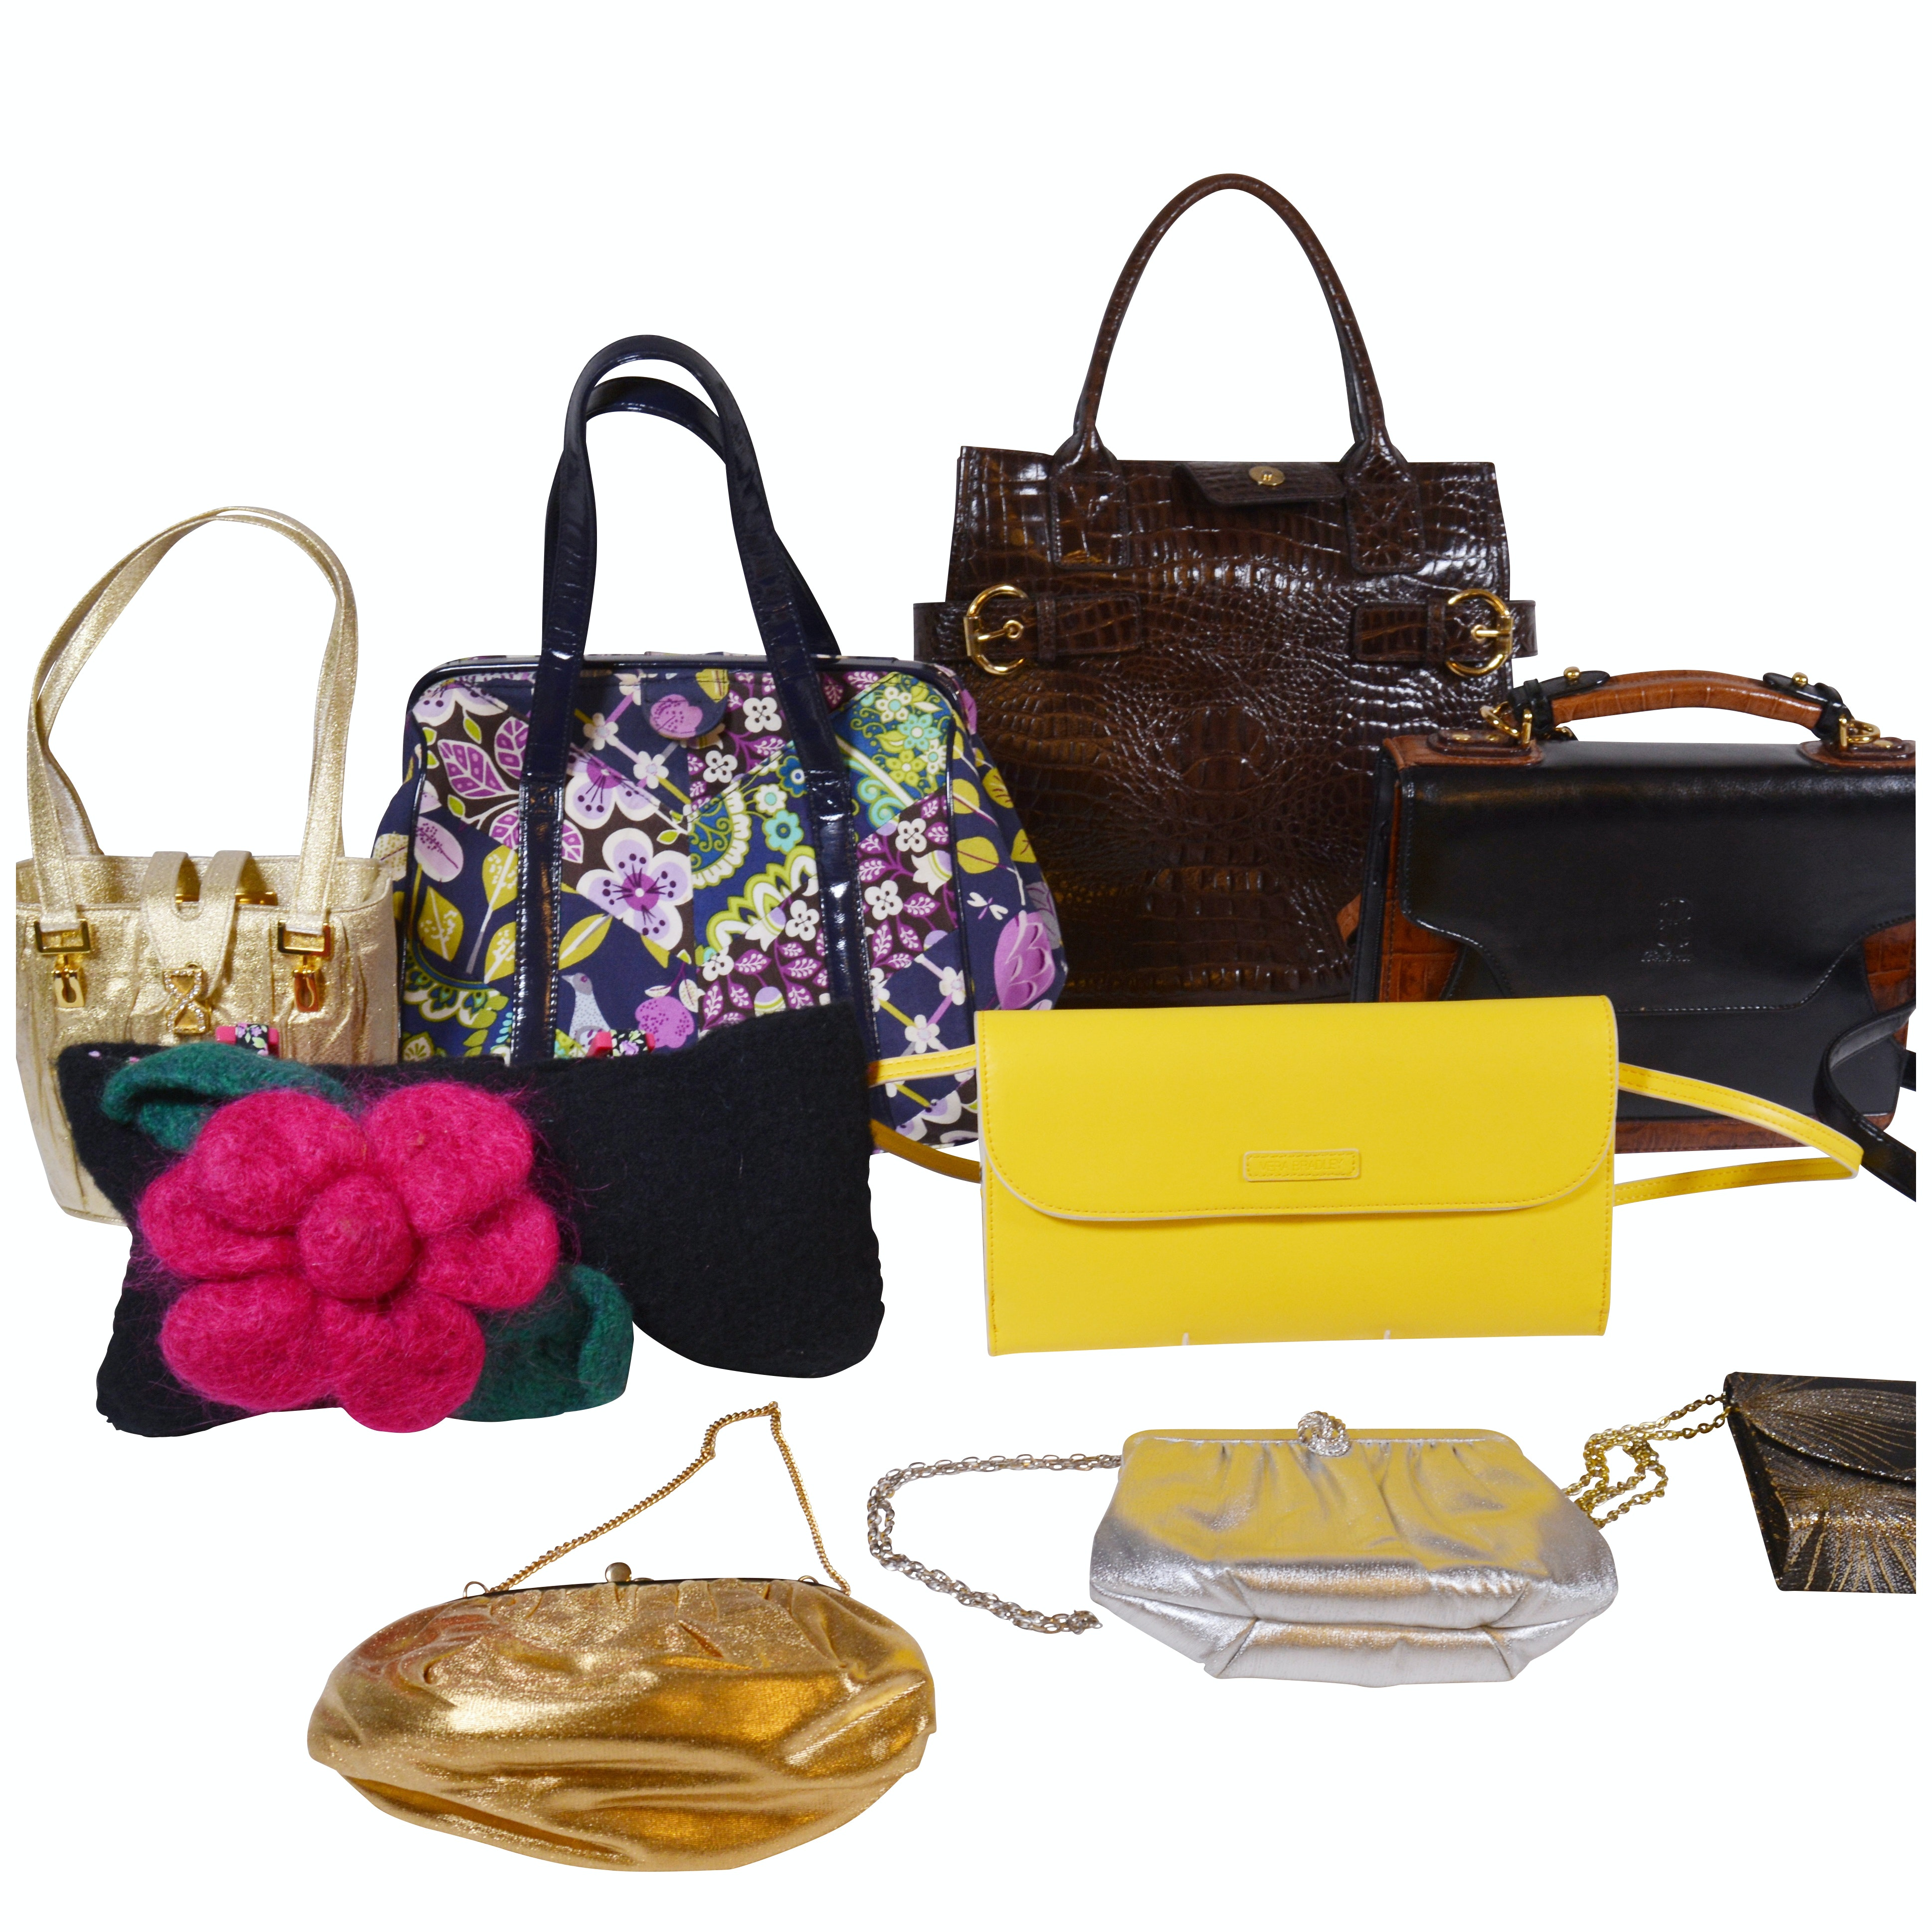 Vera Bradley Leather Handbag, Peck & Peck, and Other Handbags